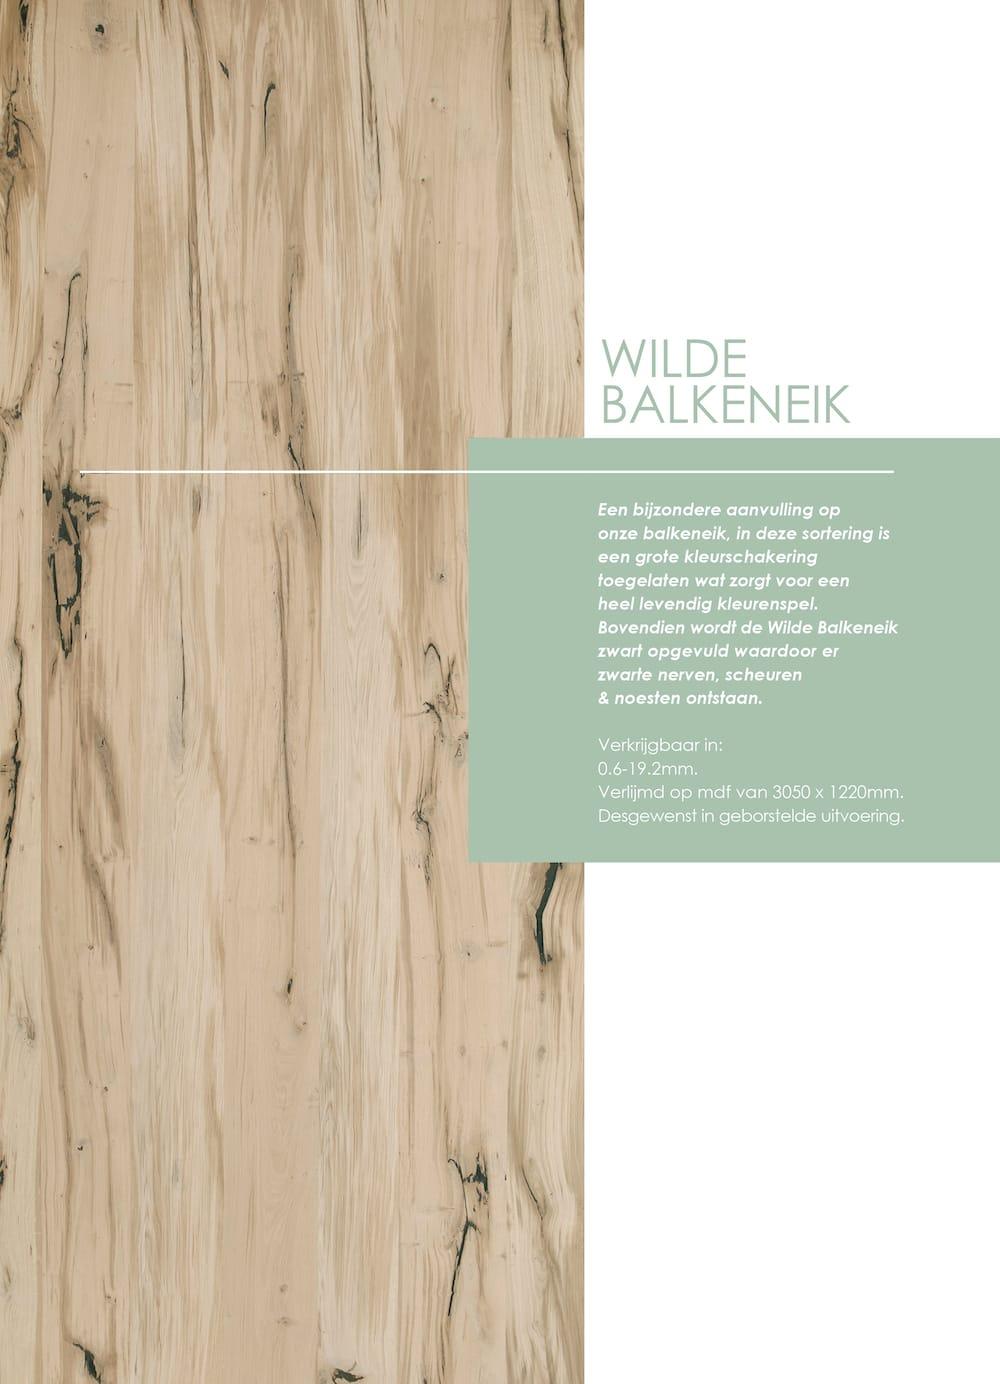 01b_zkl_GVi_c_def_mei2020_FOLDER_fineer_wildebalkeneik_paneel